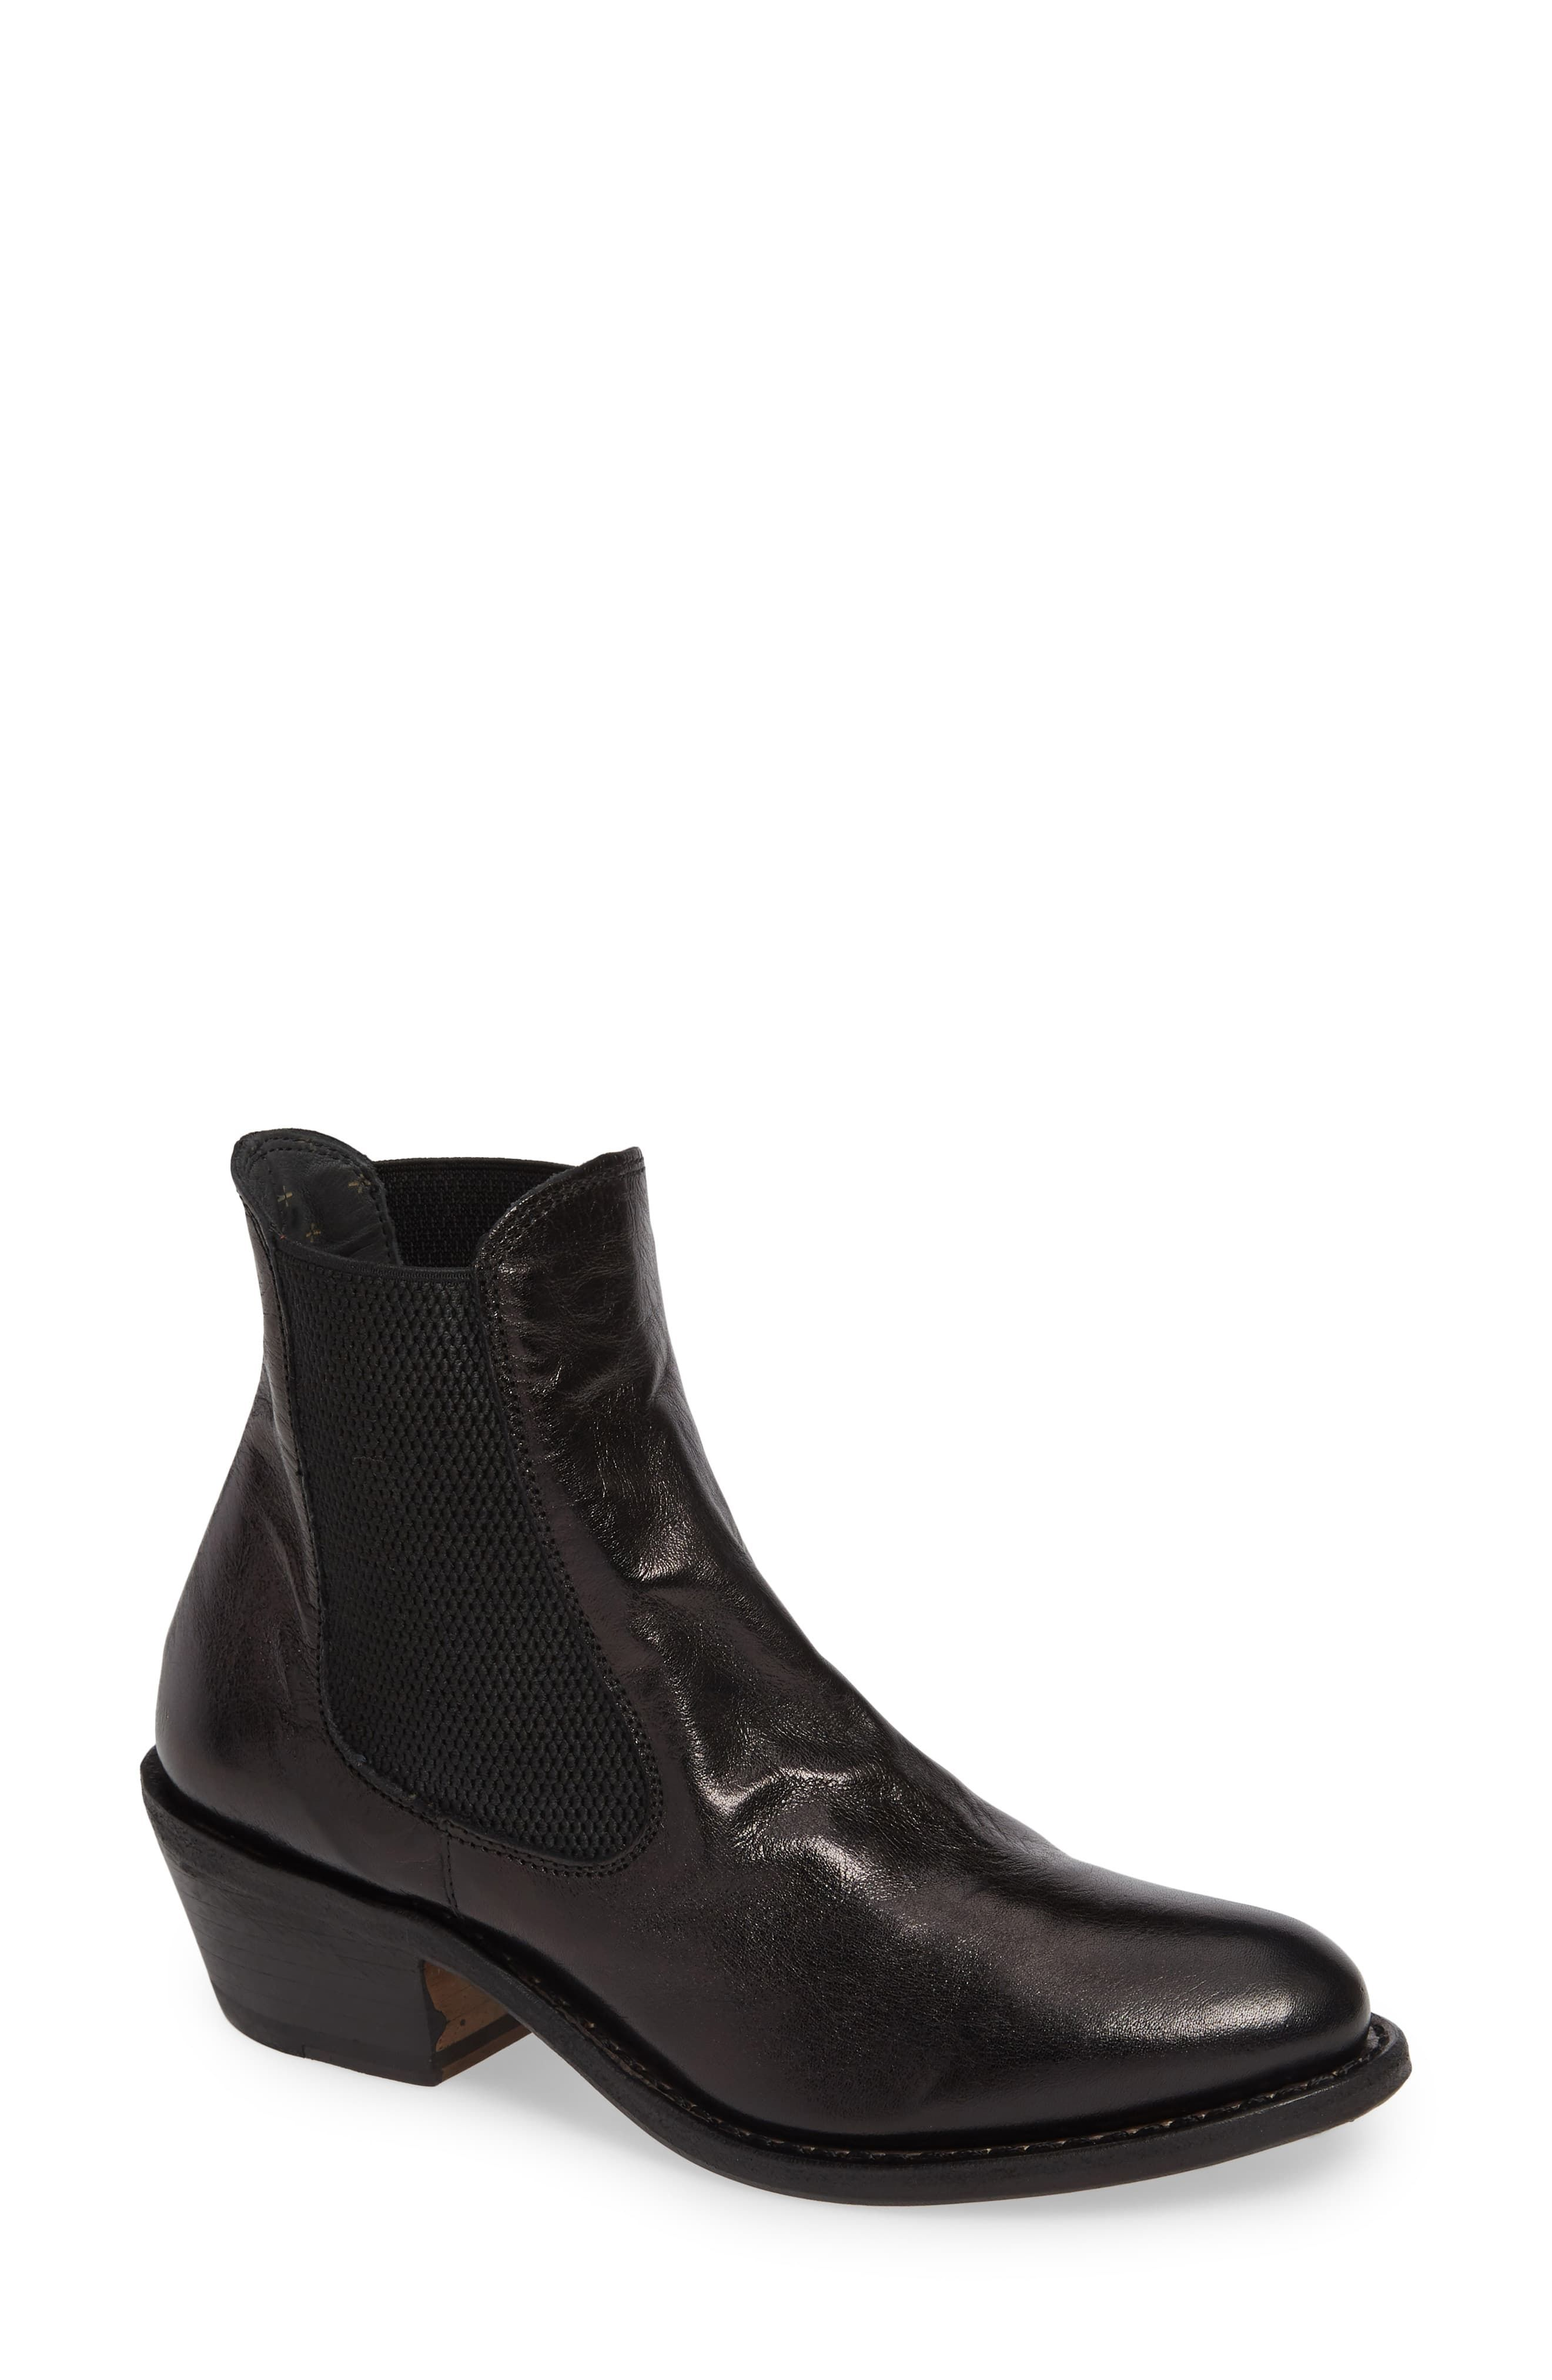 834997496bddd Roxy Margo J Womens Boots   Shoes   Roxy boots, Boots, Roxy